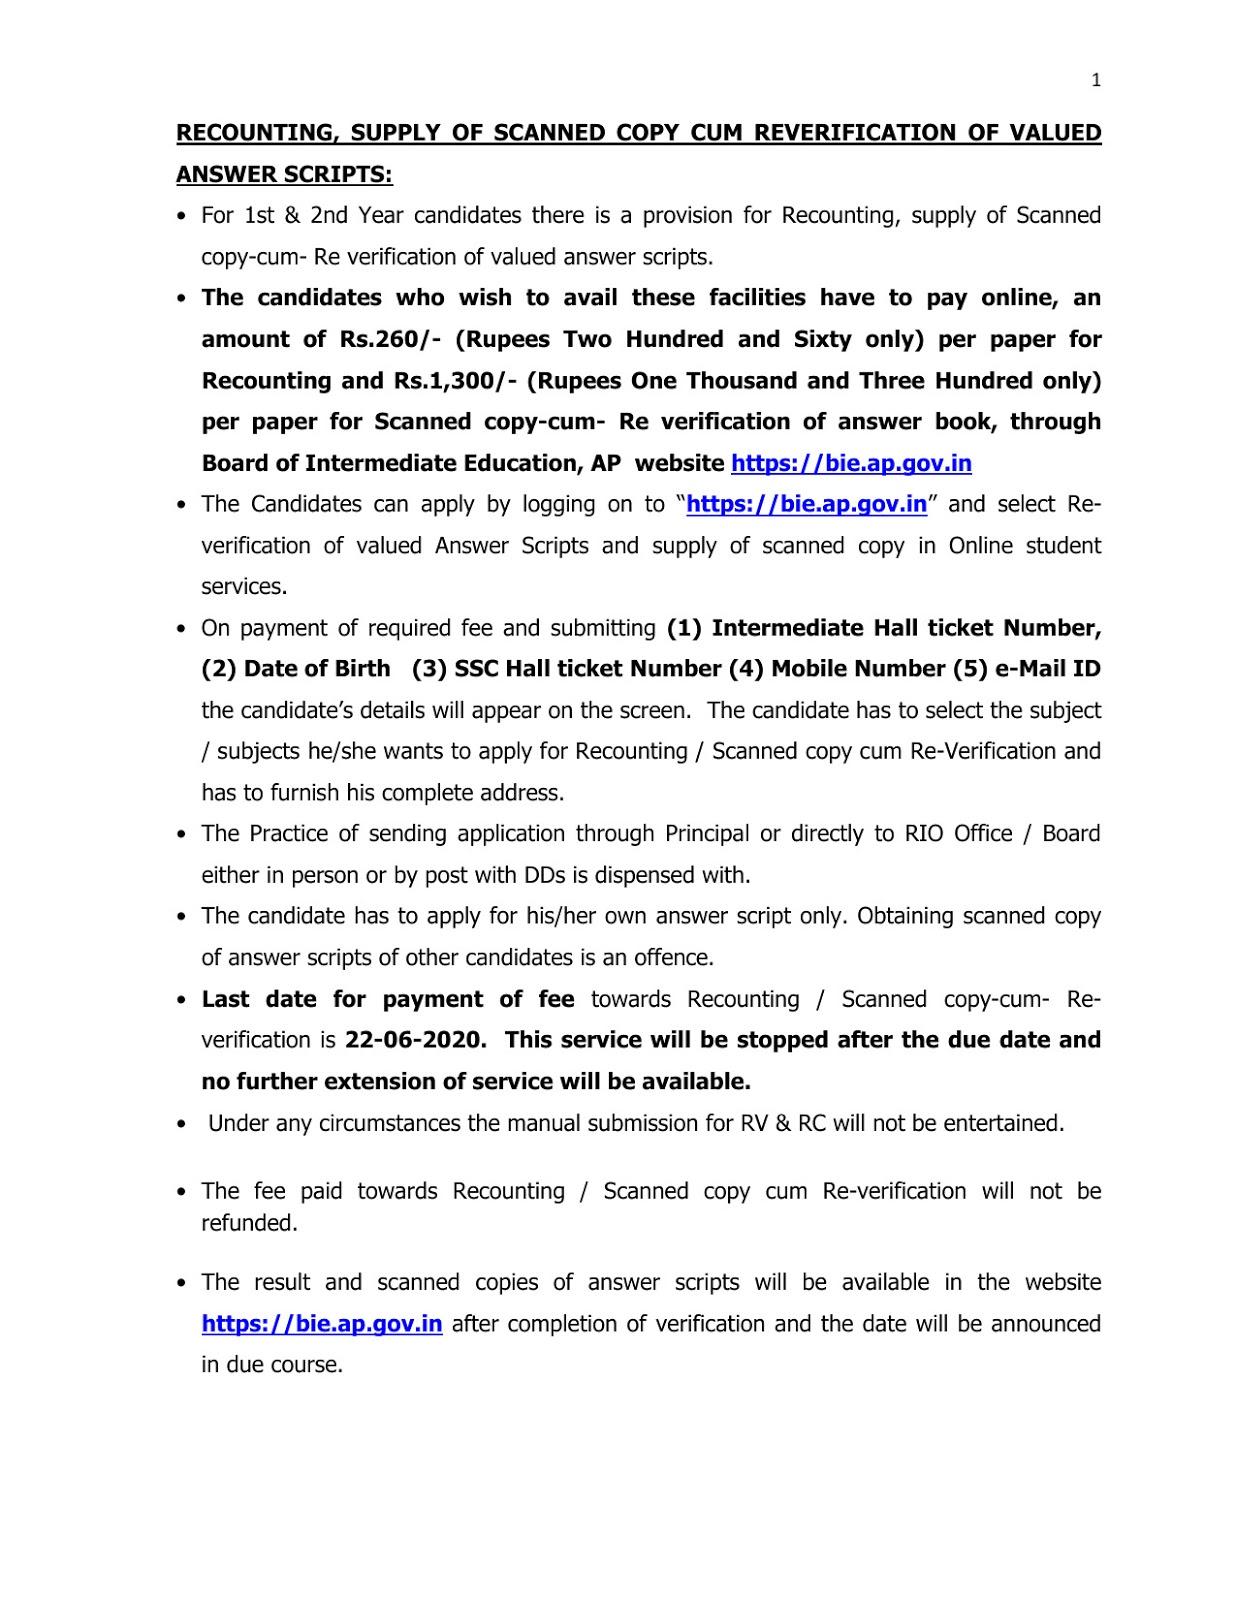 AP Intermediate Recounting & Reverification Notification